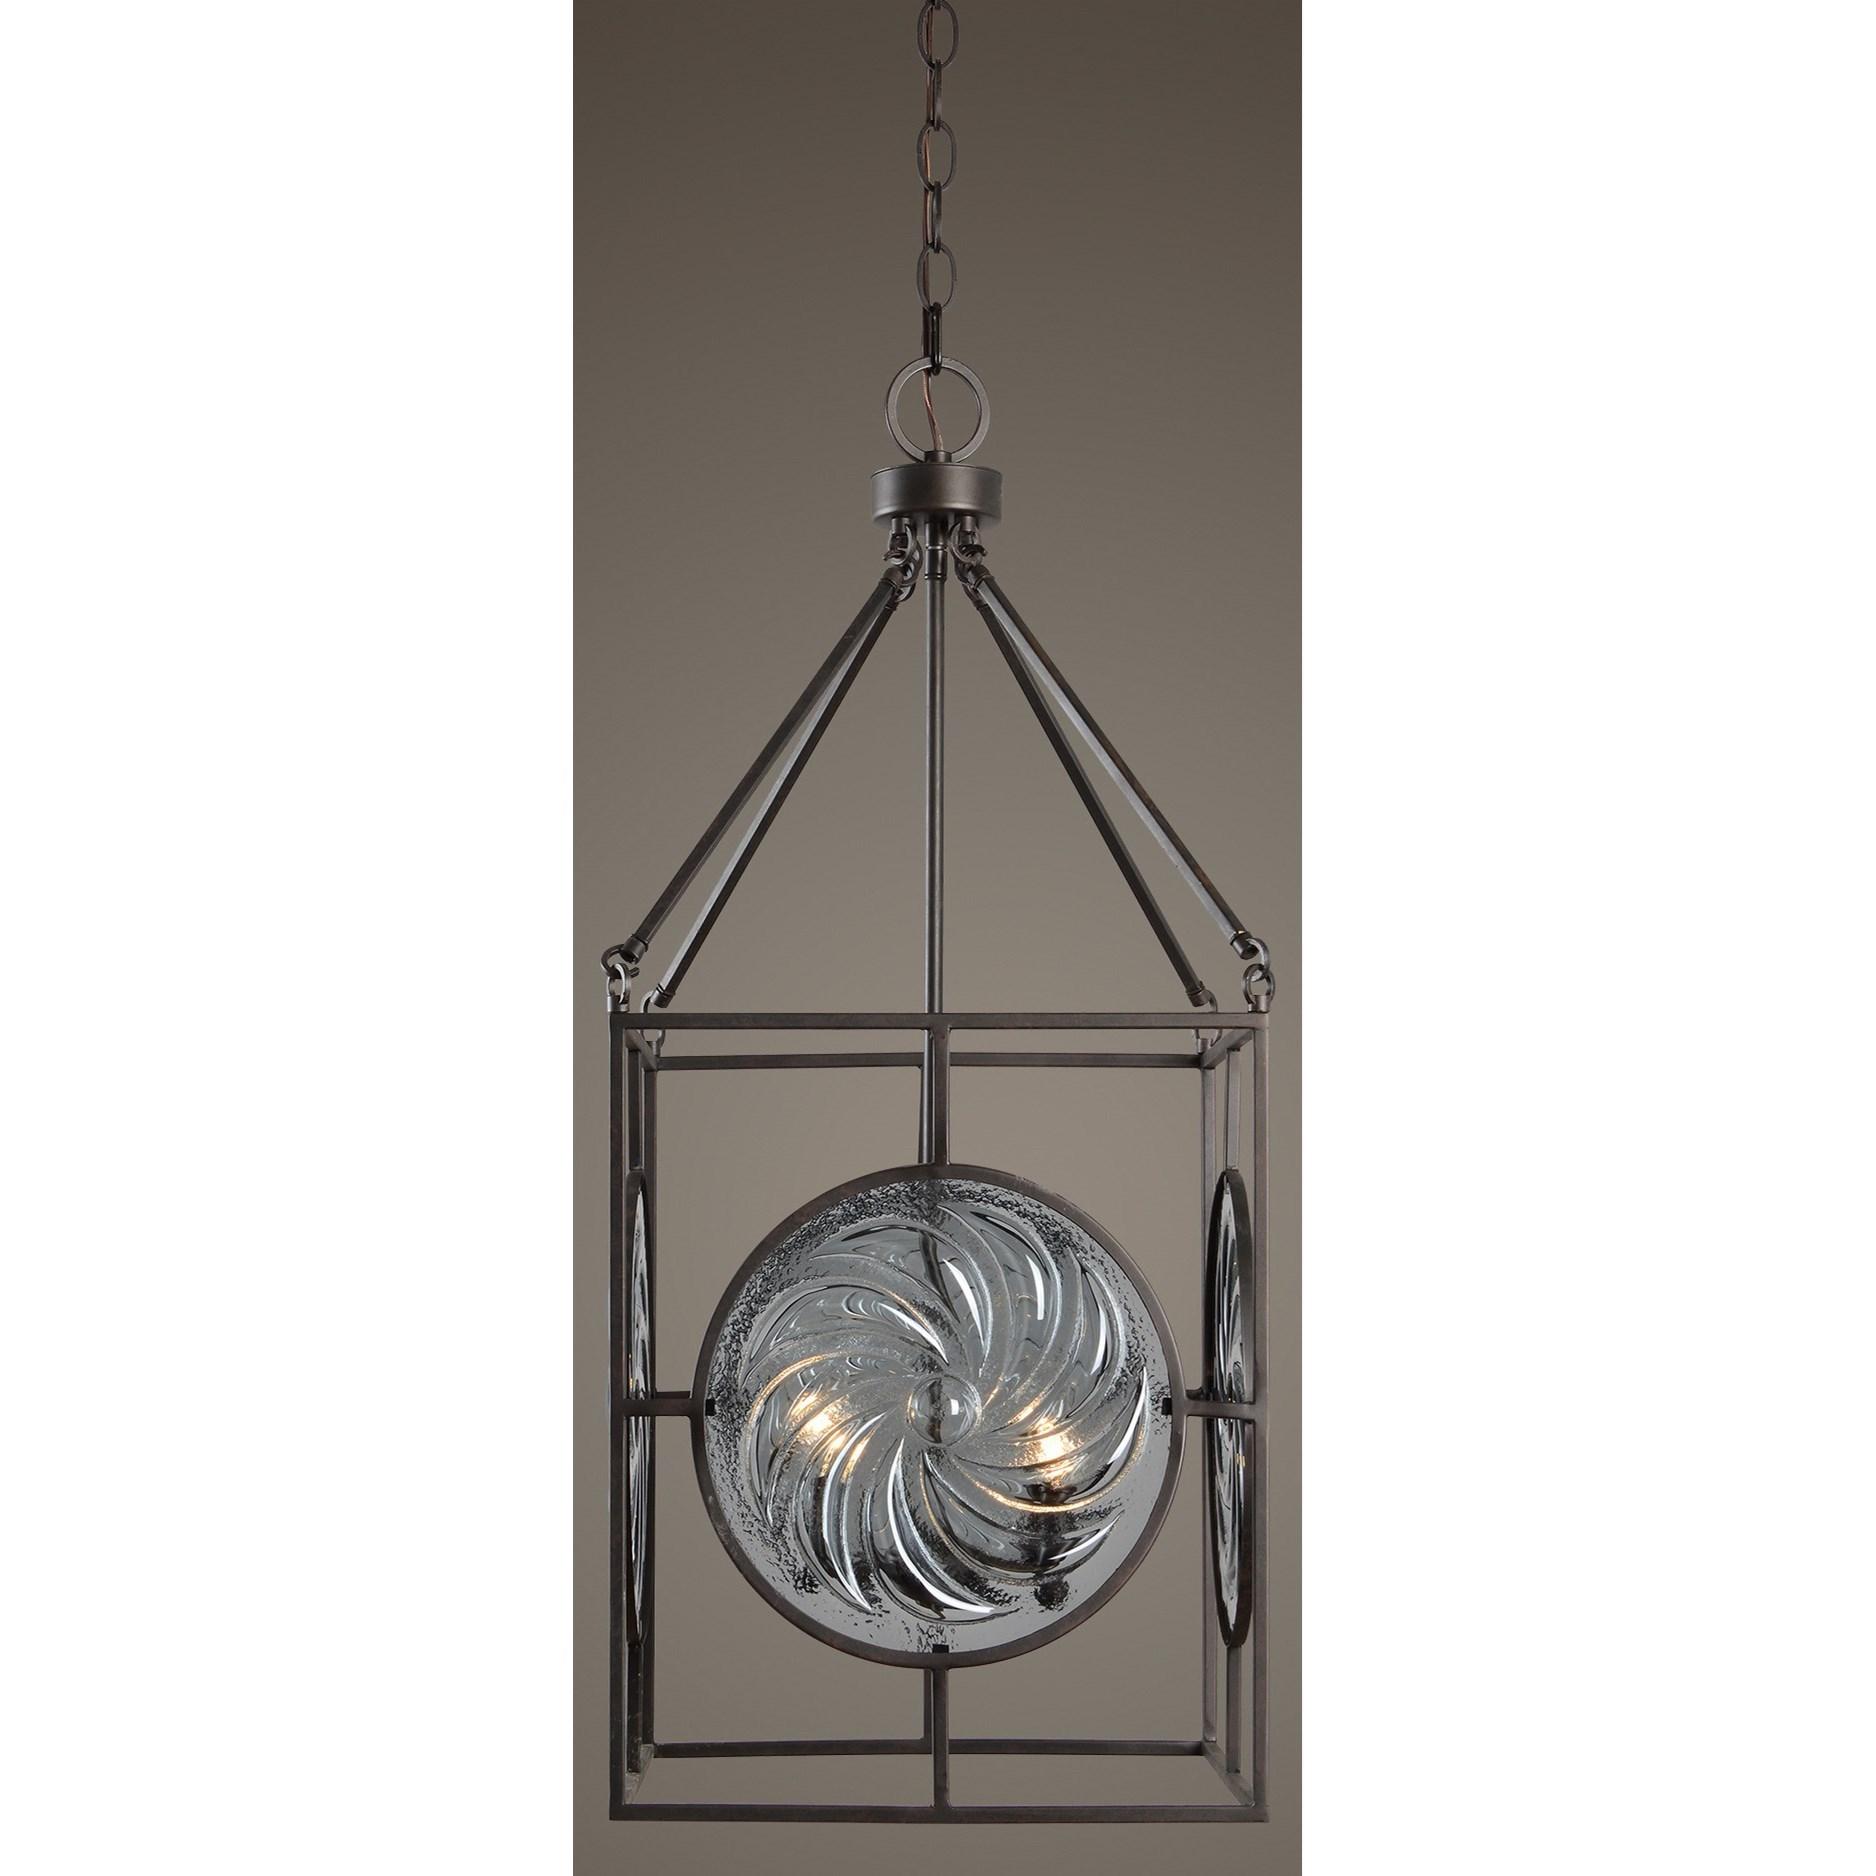 Uttermost Lighting Fixtures Volute 4 Lt Pendant Dunk & Bright Furniture Pendant Lights